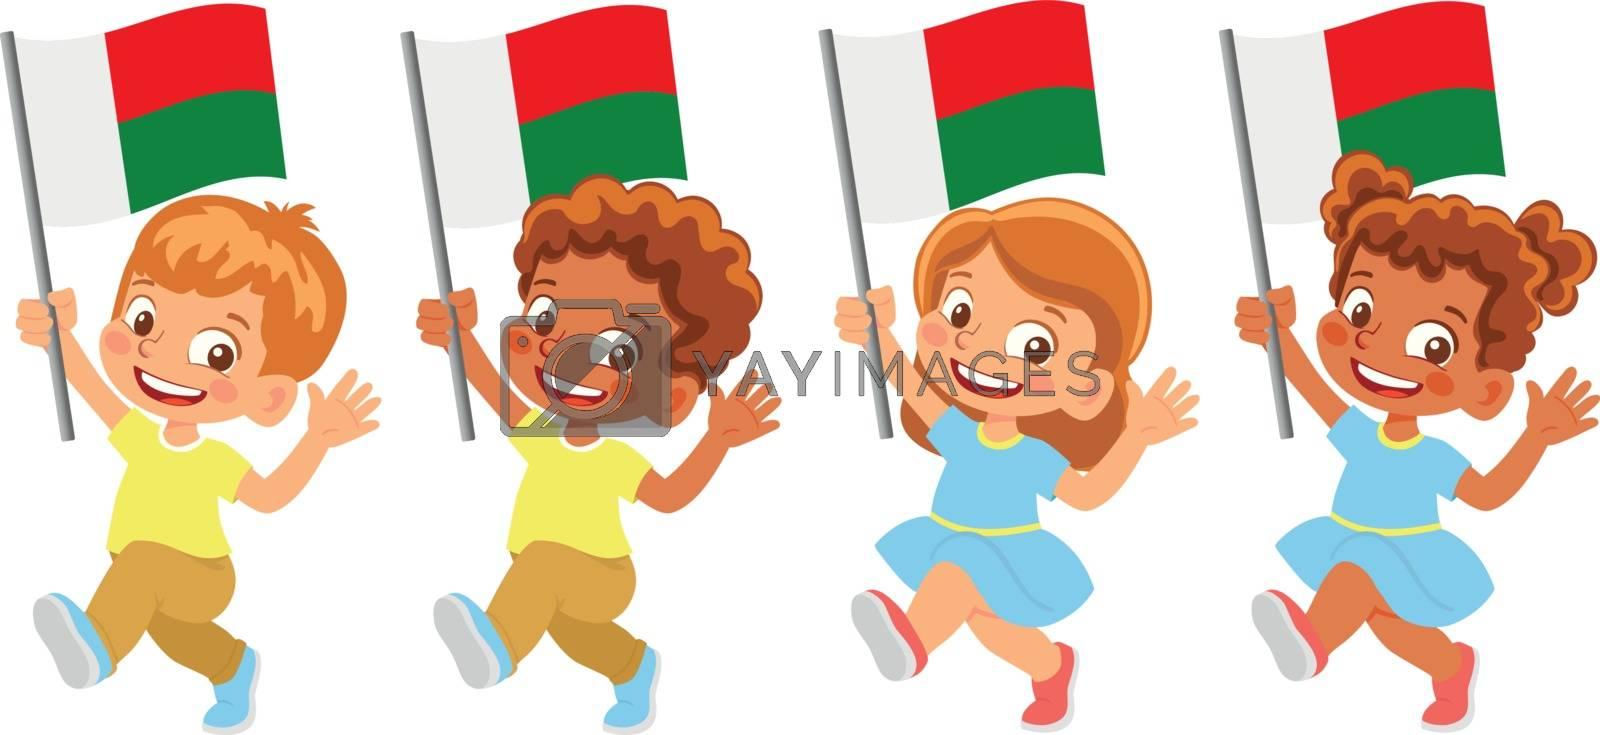 Madagascar flag in hand. Children holding flag. National flag of Madagascar vector